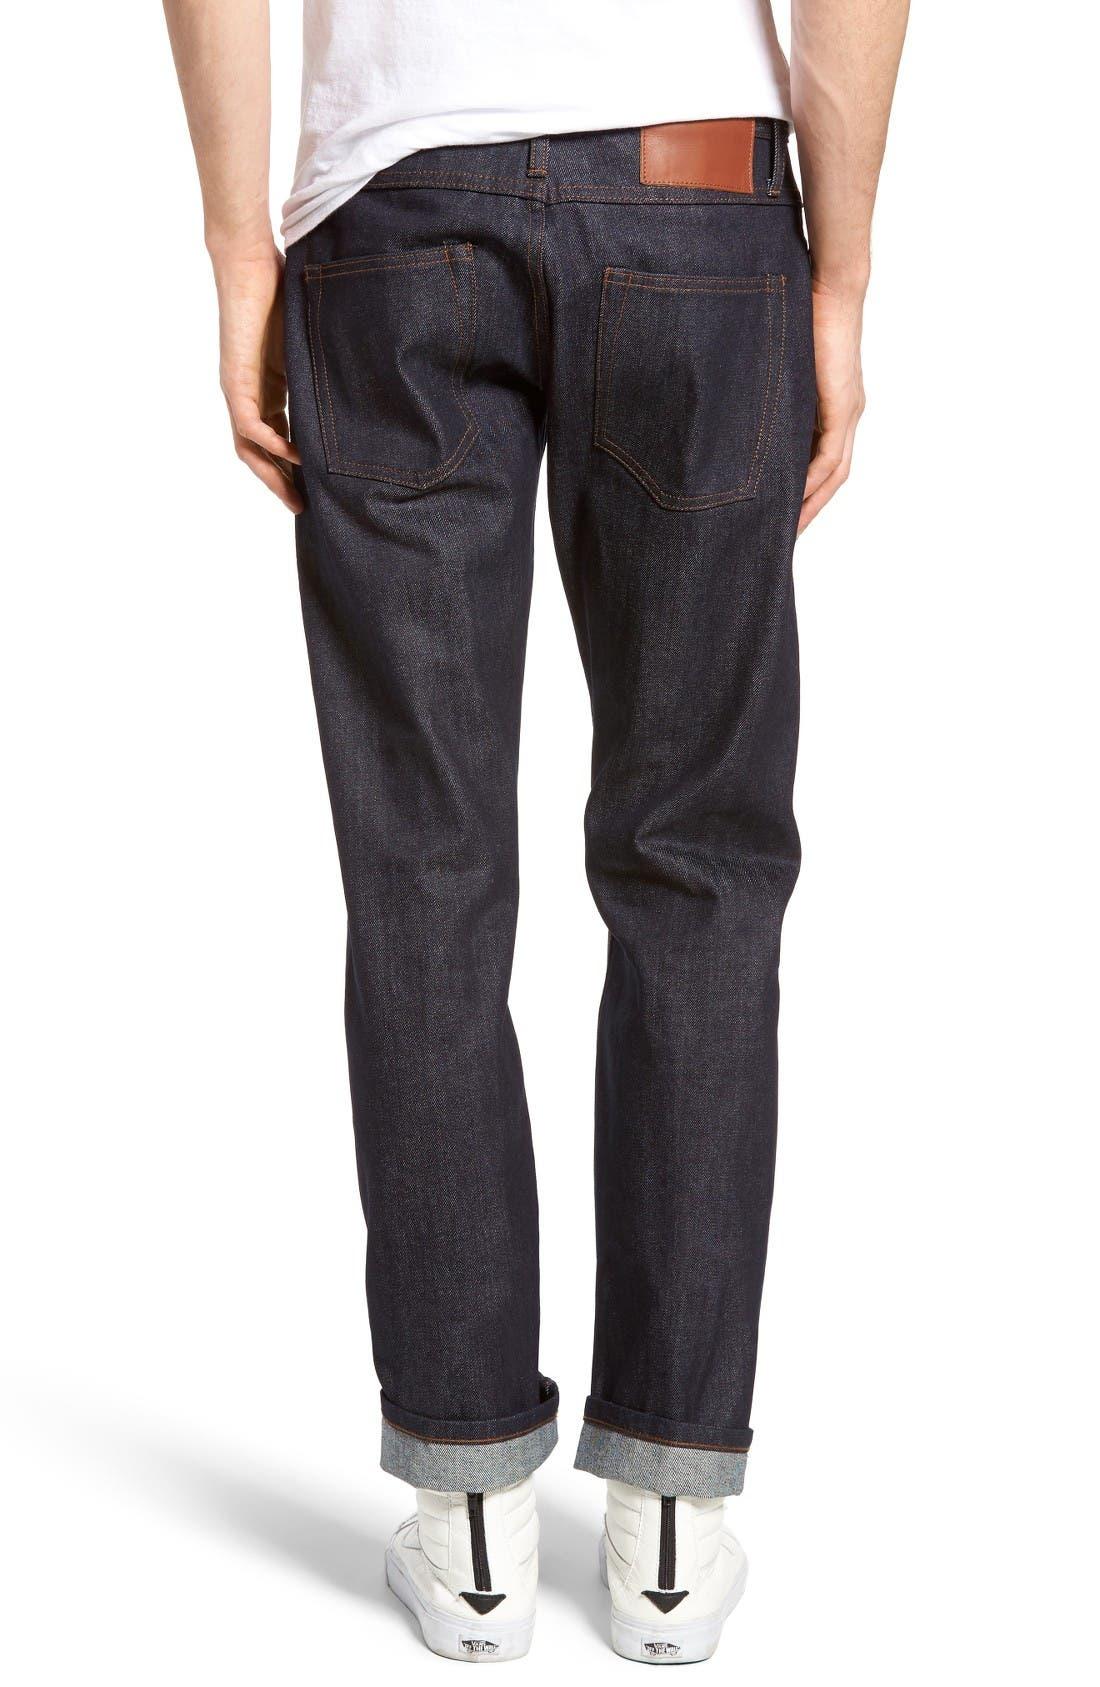 Alternate Image 2  - The Unbranded Brand UB301 Straight Leg Raw Selvedge Jeans (Indigo)